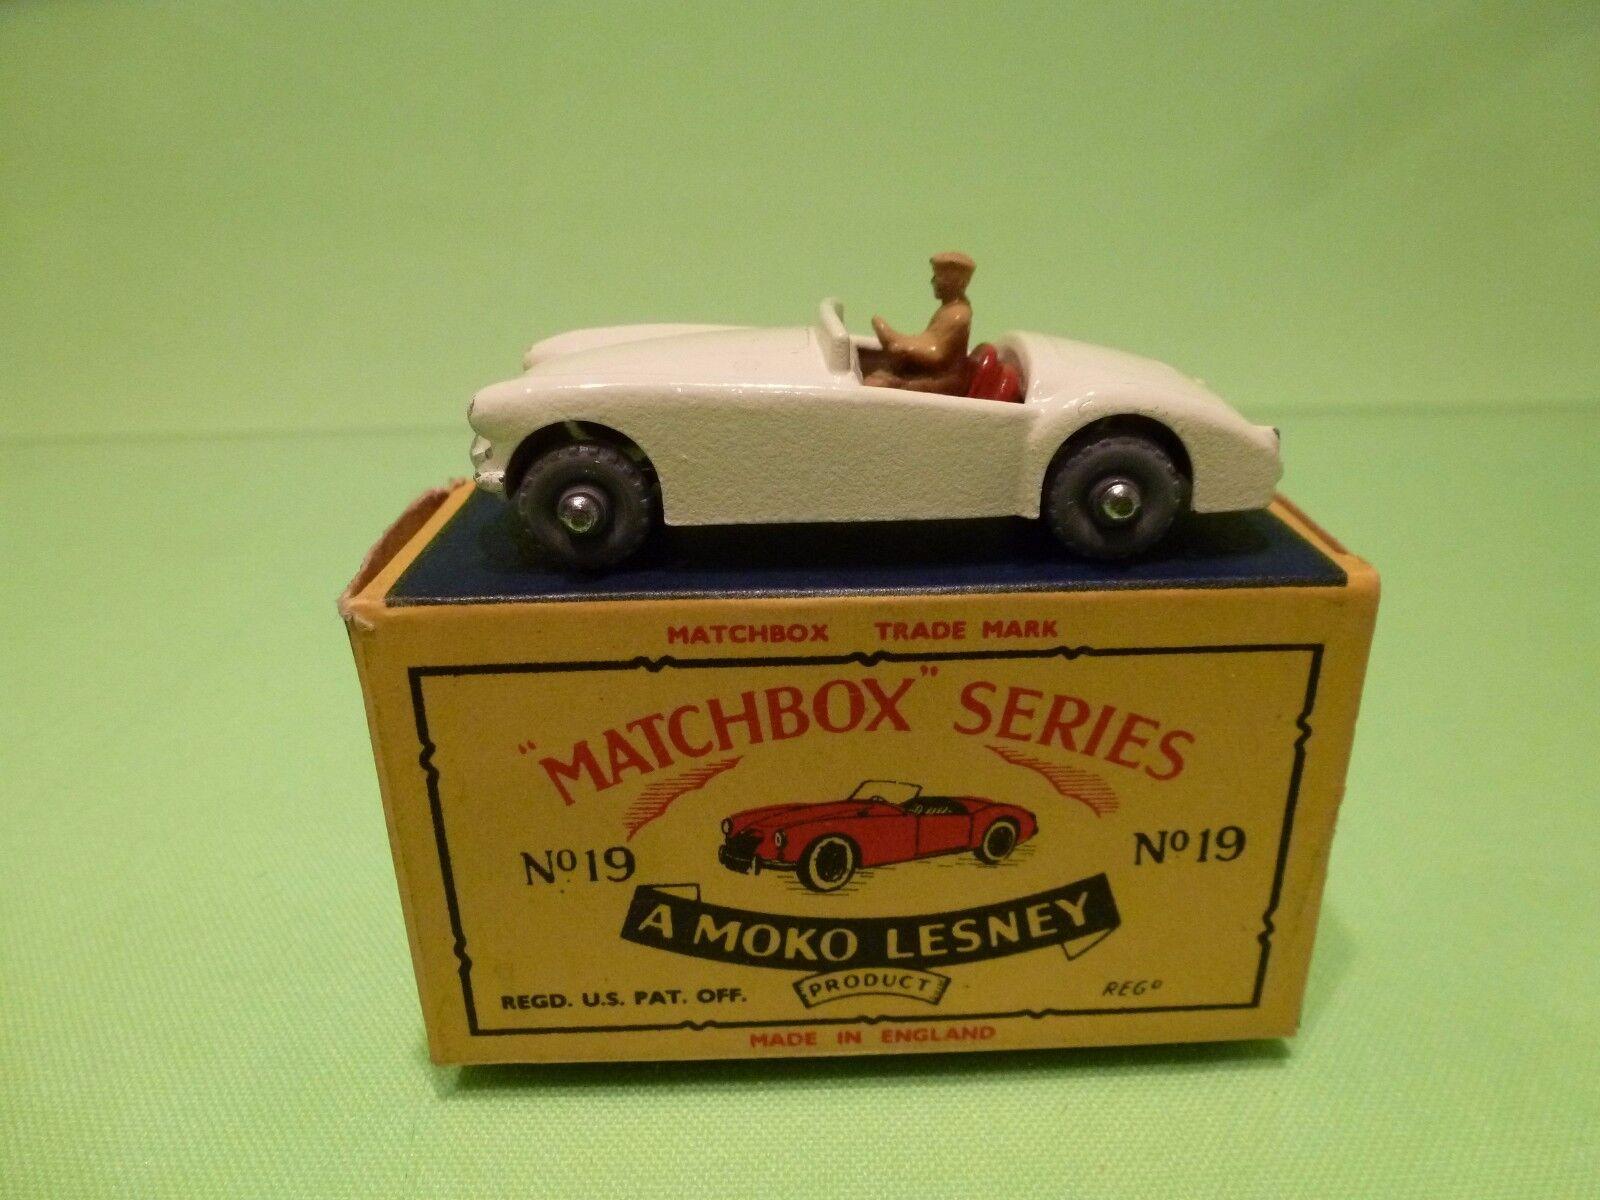 LESNEY 19 MG A SPORTS CAR - BROKEN bianca - MINT IN BOX - HIGH QUALITY